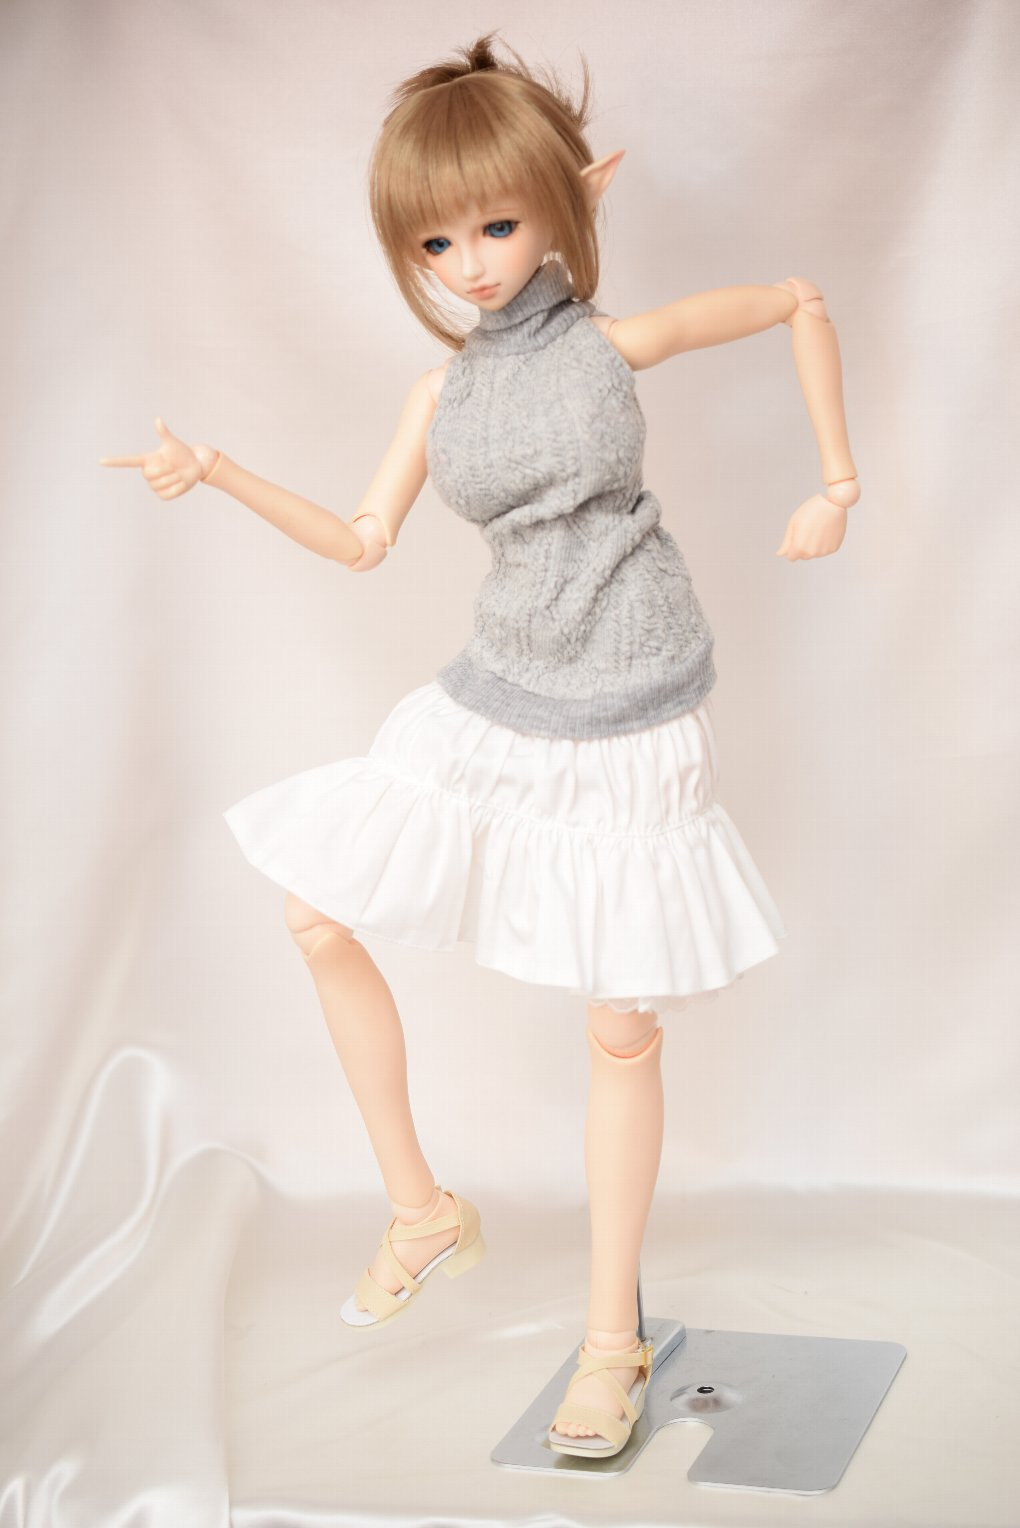 doll_4574.jpg